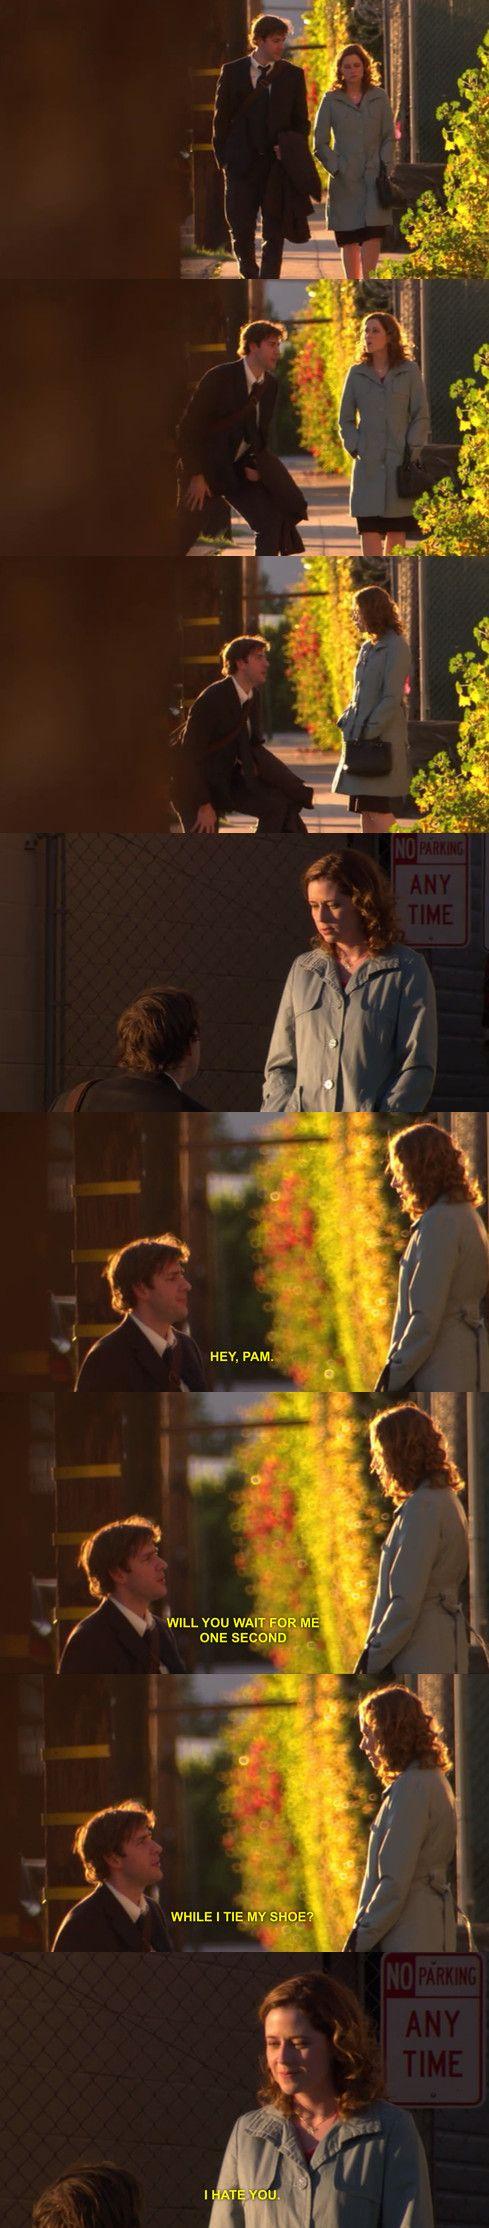 the office, television, 2000s, comedy, John Krasinski, Jenna Fischer